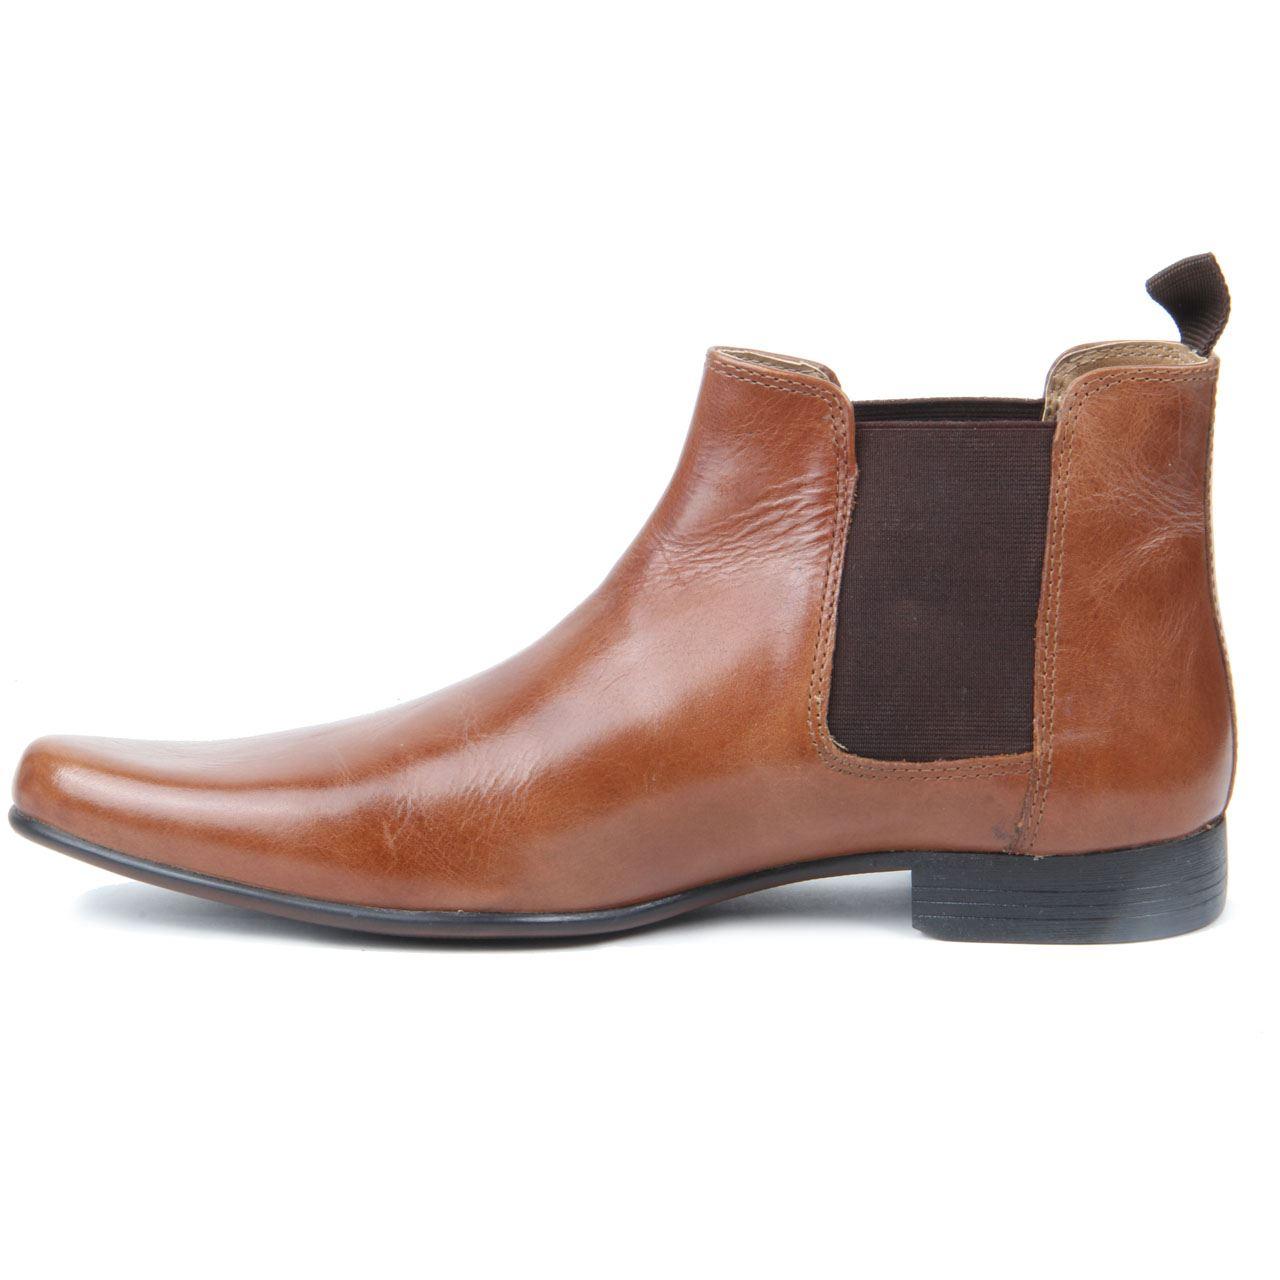 Boys Kids Slip On Genuine Leather Western Heel Pointed Toe Chelsea Boots